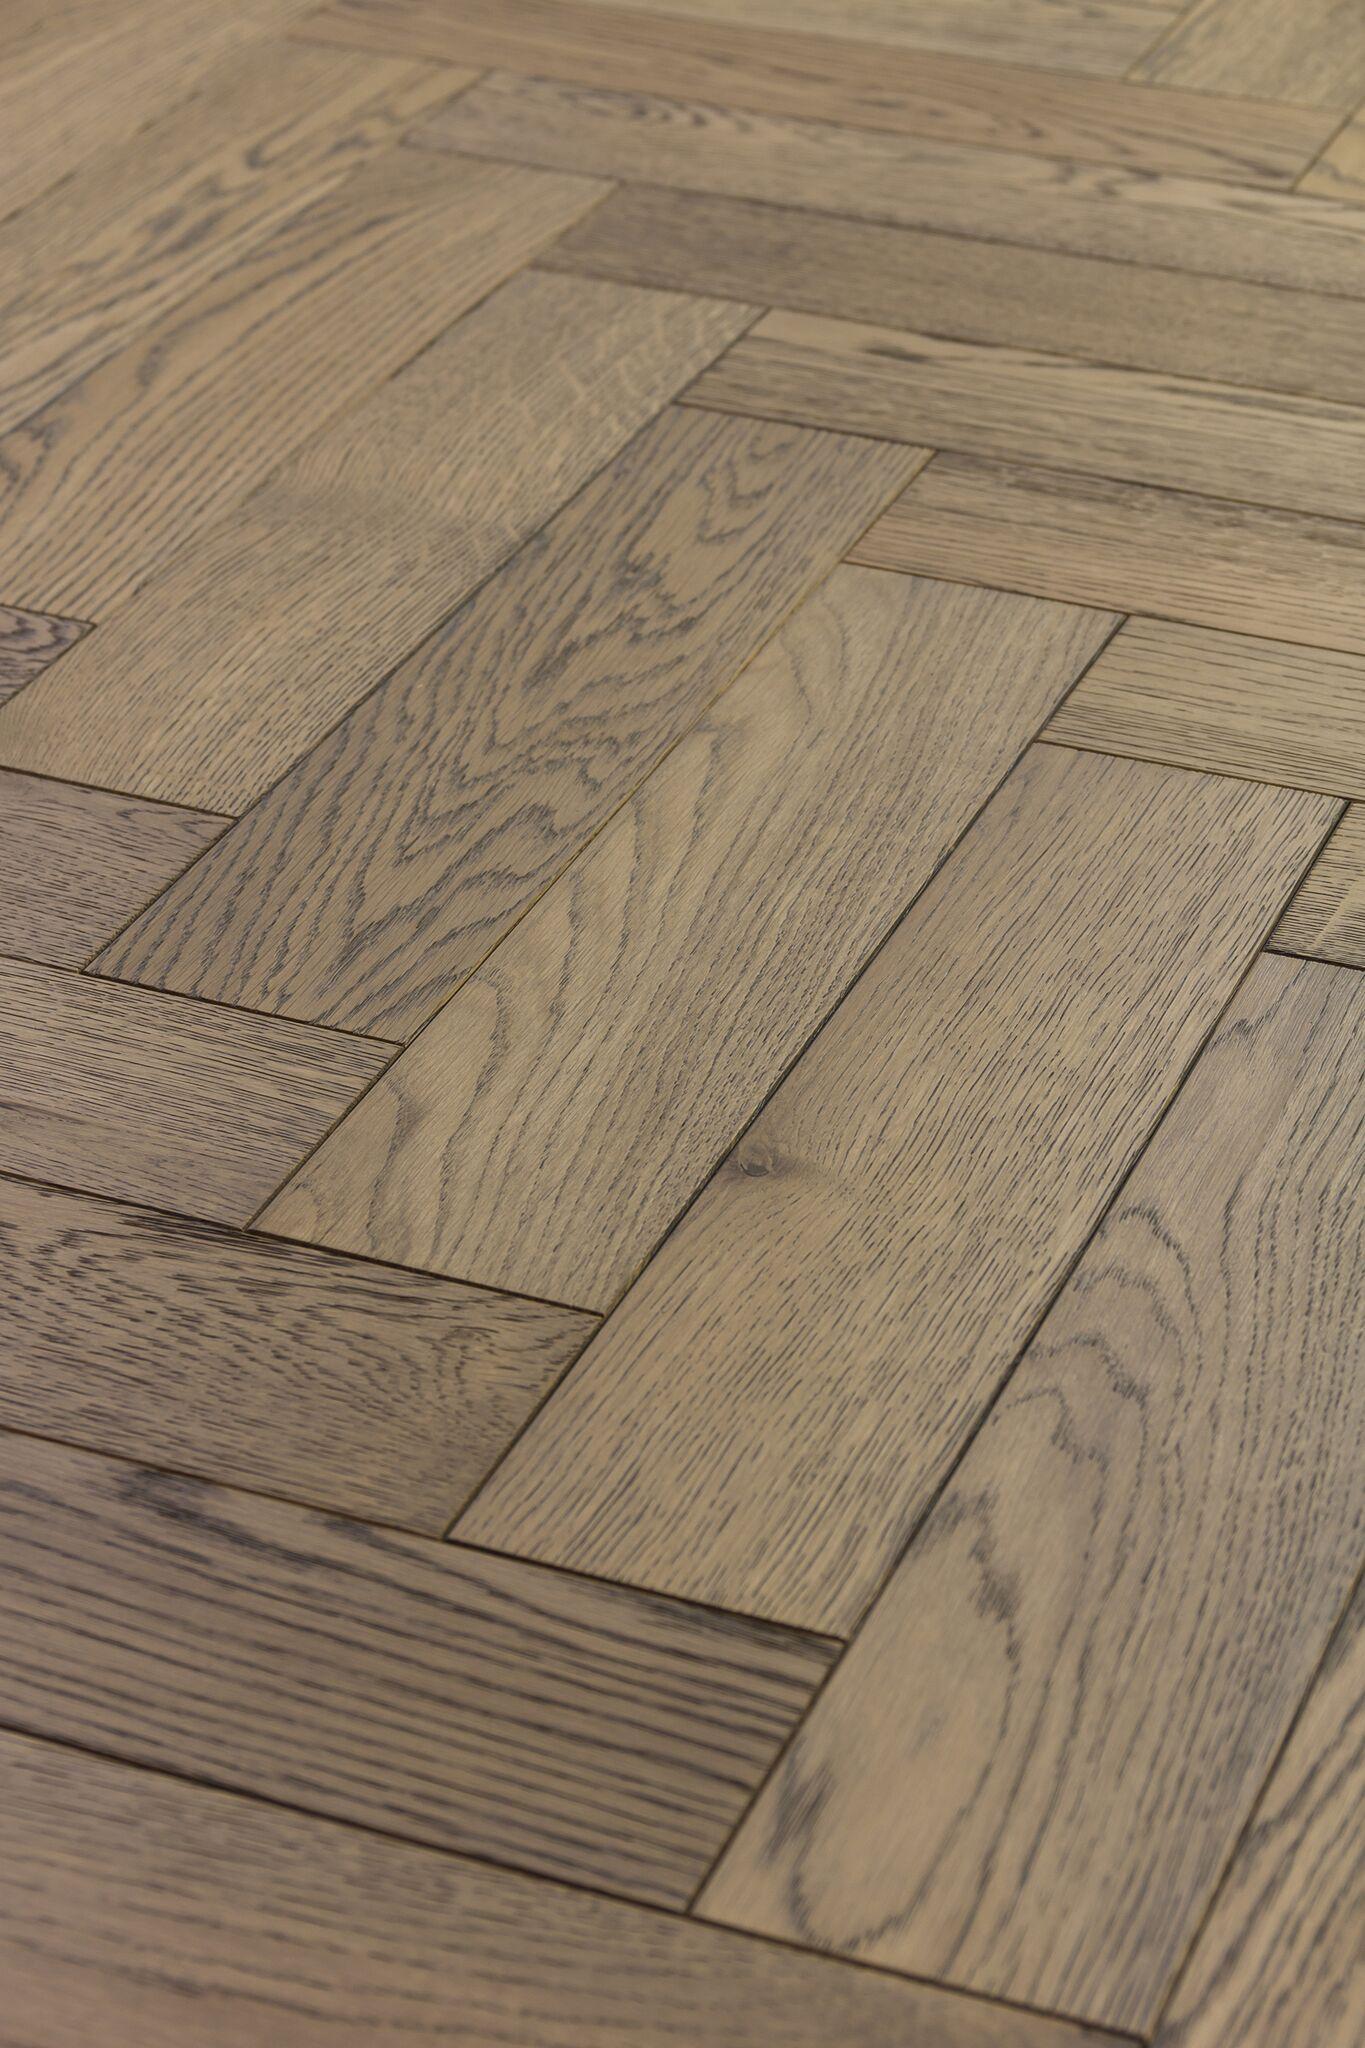 Mwf 656 Sunset Haze Rustic Oak Engineered Floor In A Herringbone Design Micro Bevelled Edge On 4 Sides Finished Wood Lye Coloured Oil And Coats Of